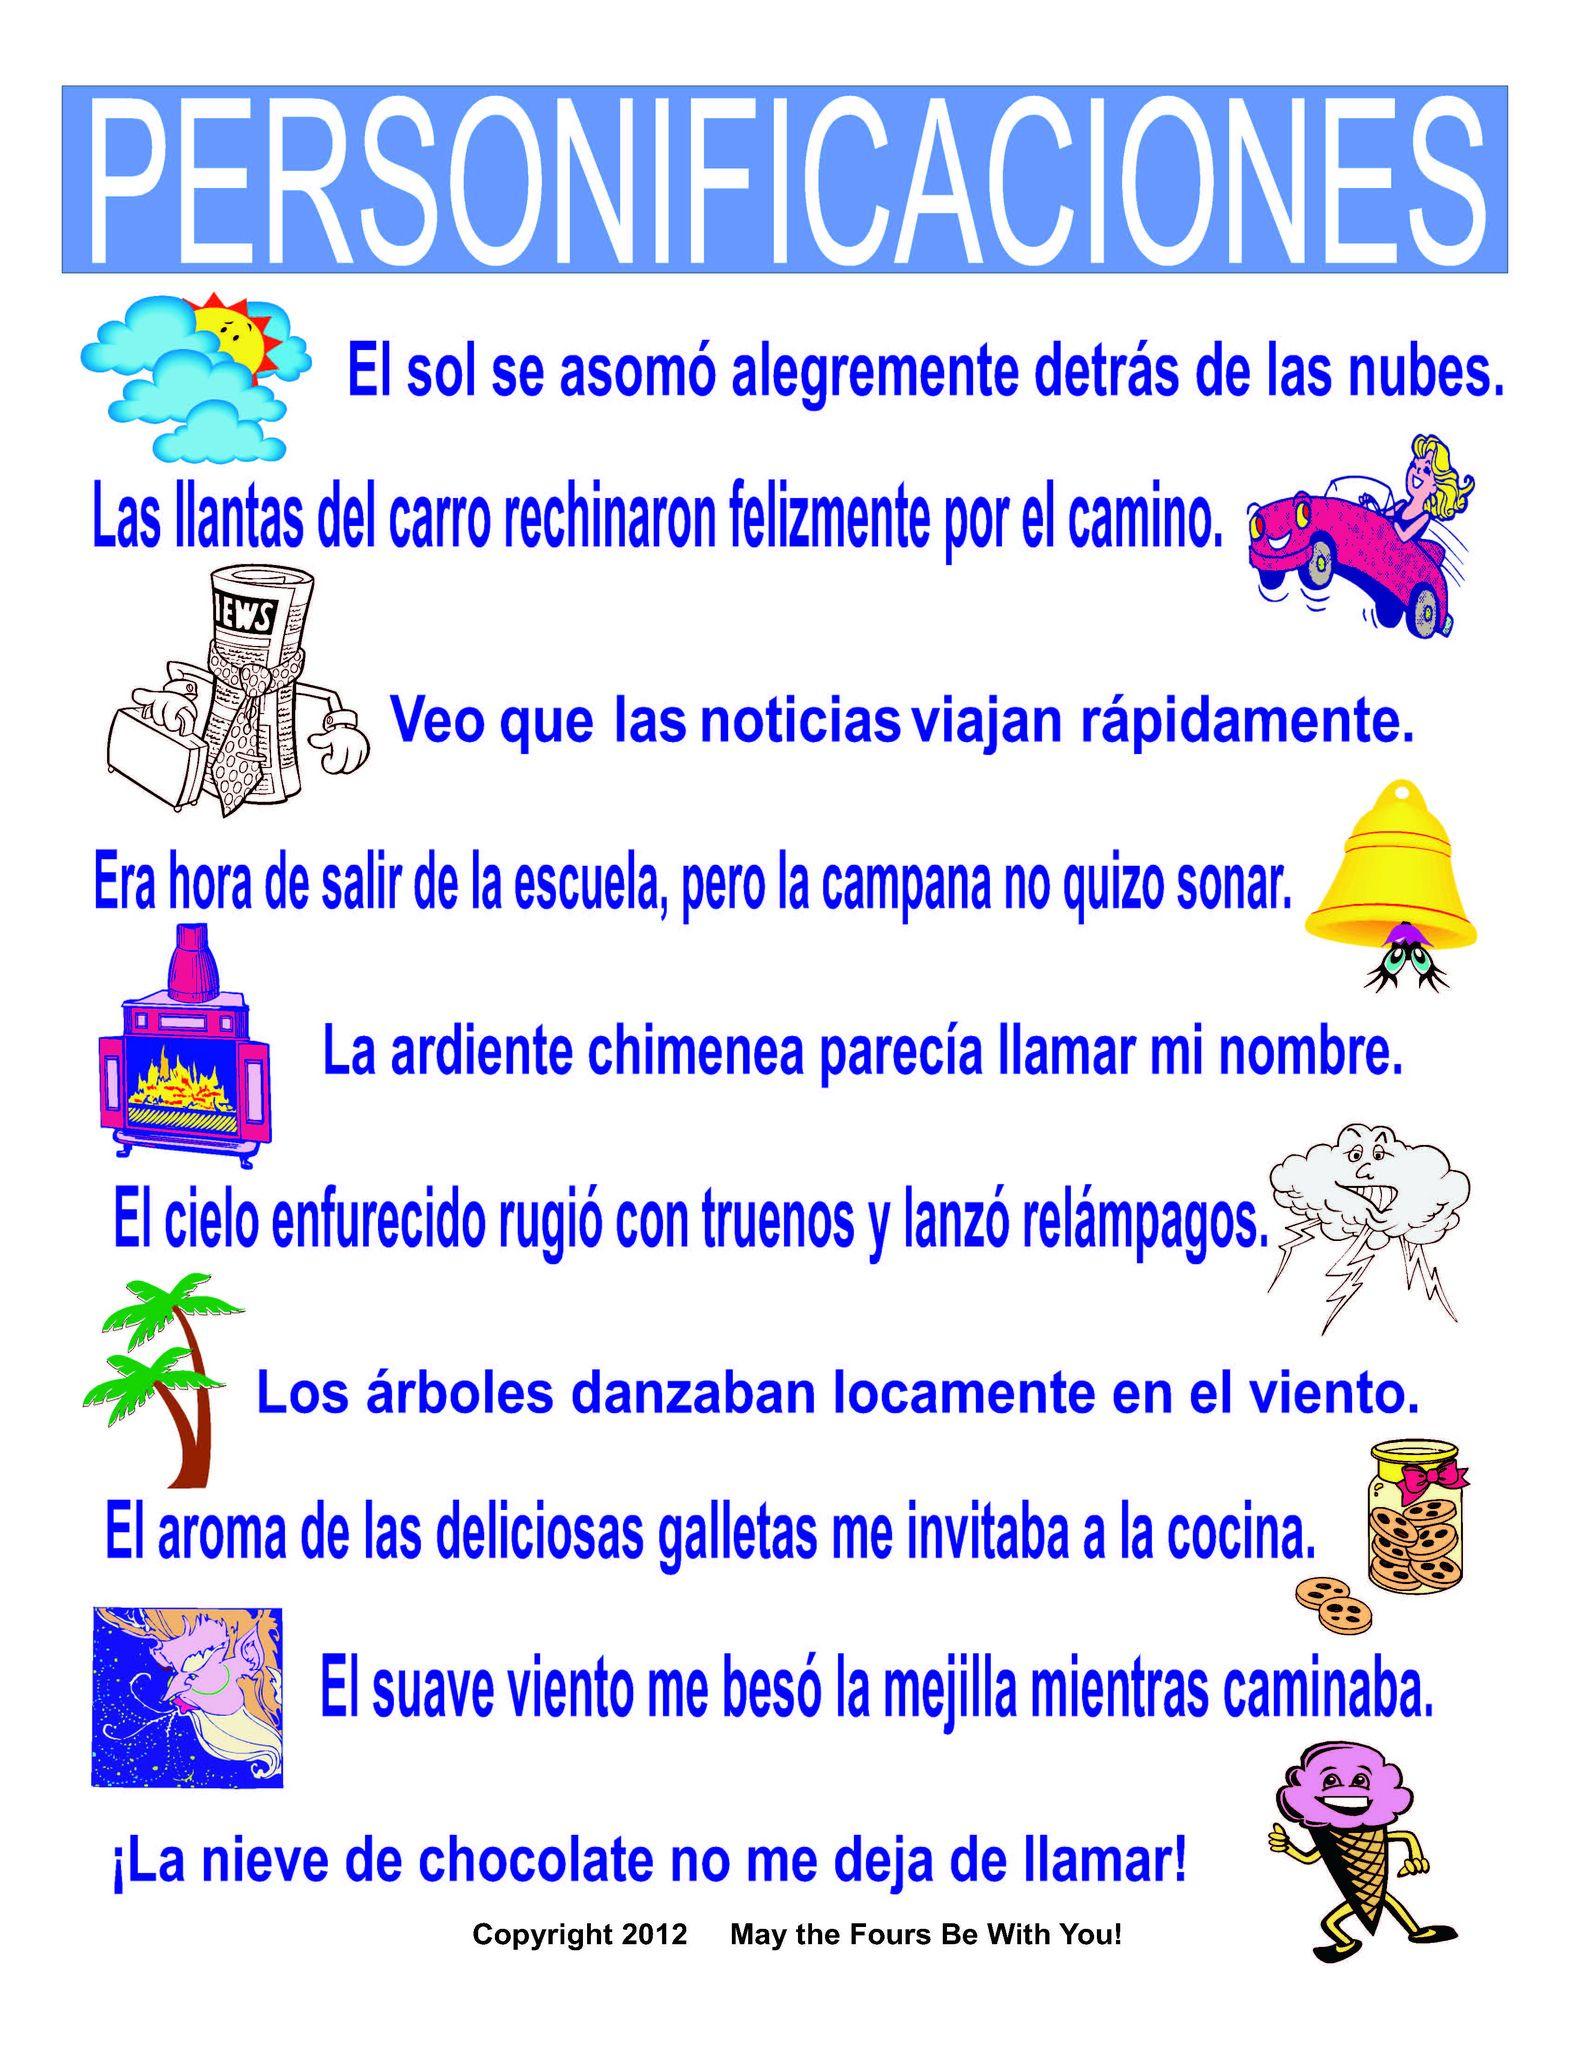 Personificaciones Spanish Classroom Poster | Literatura, Escritura y ...